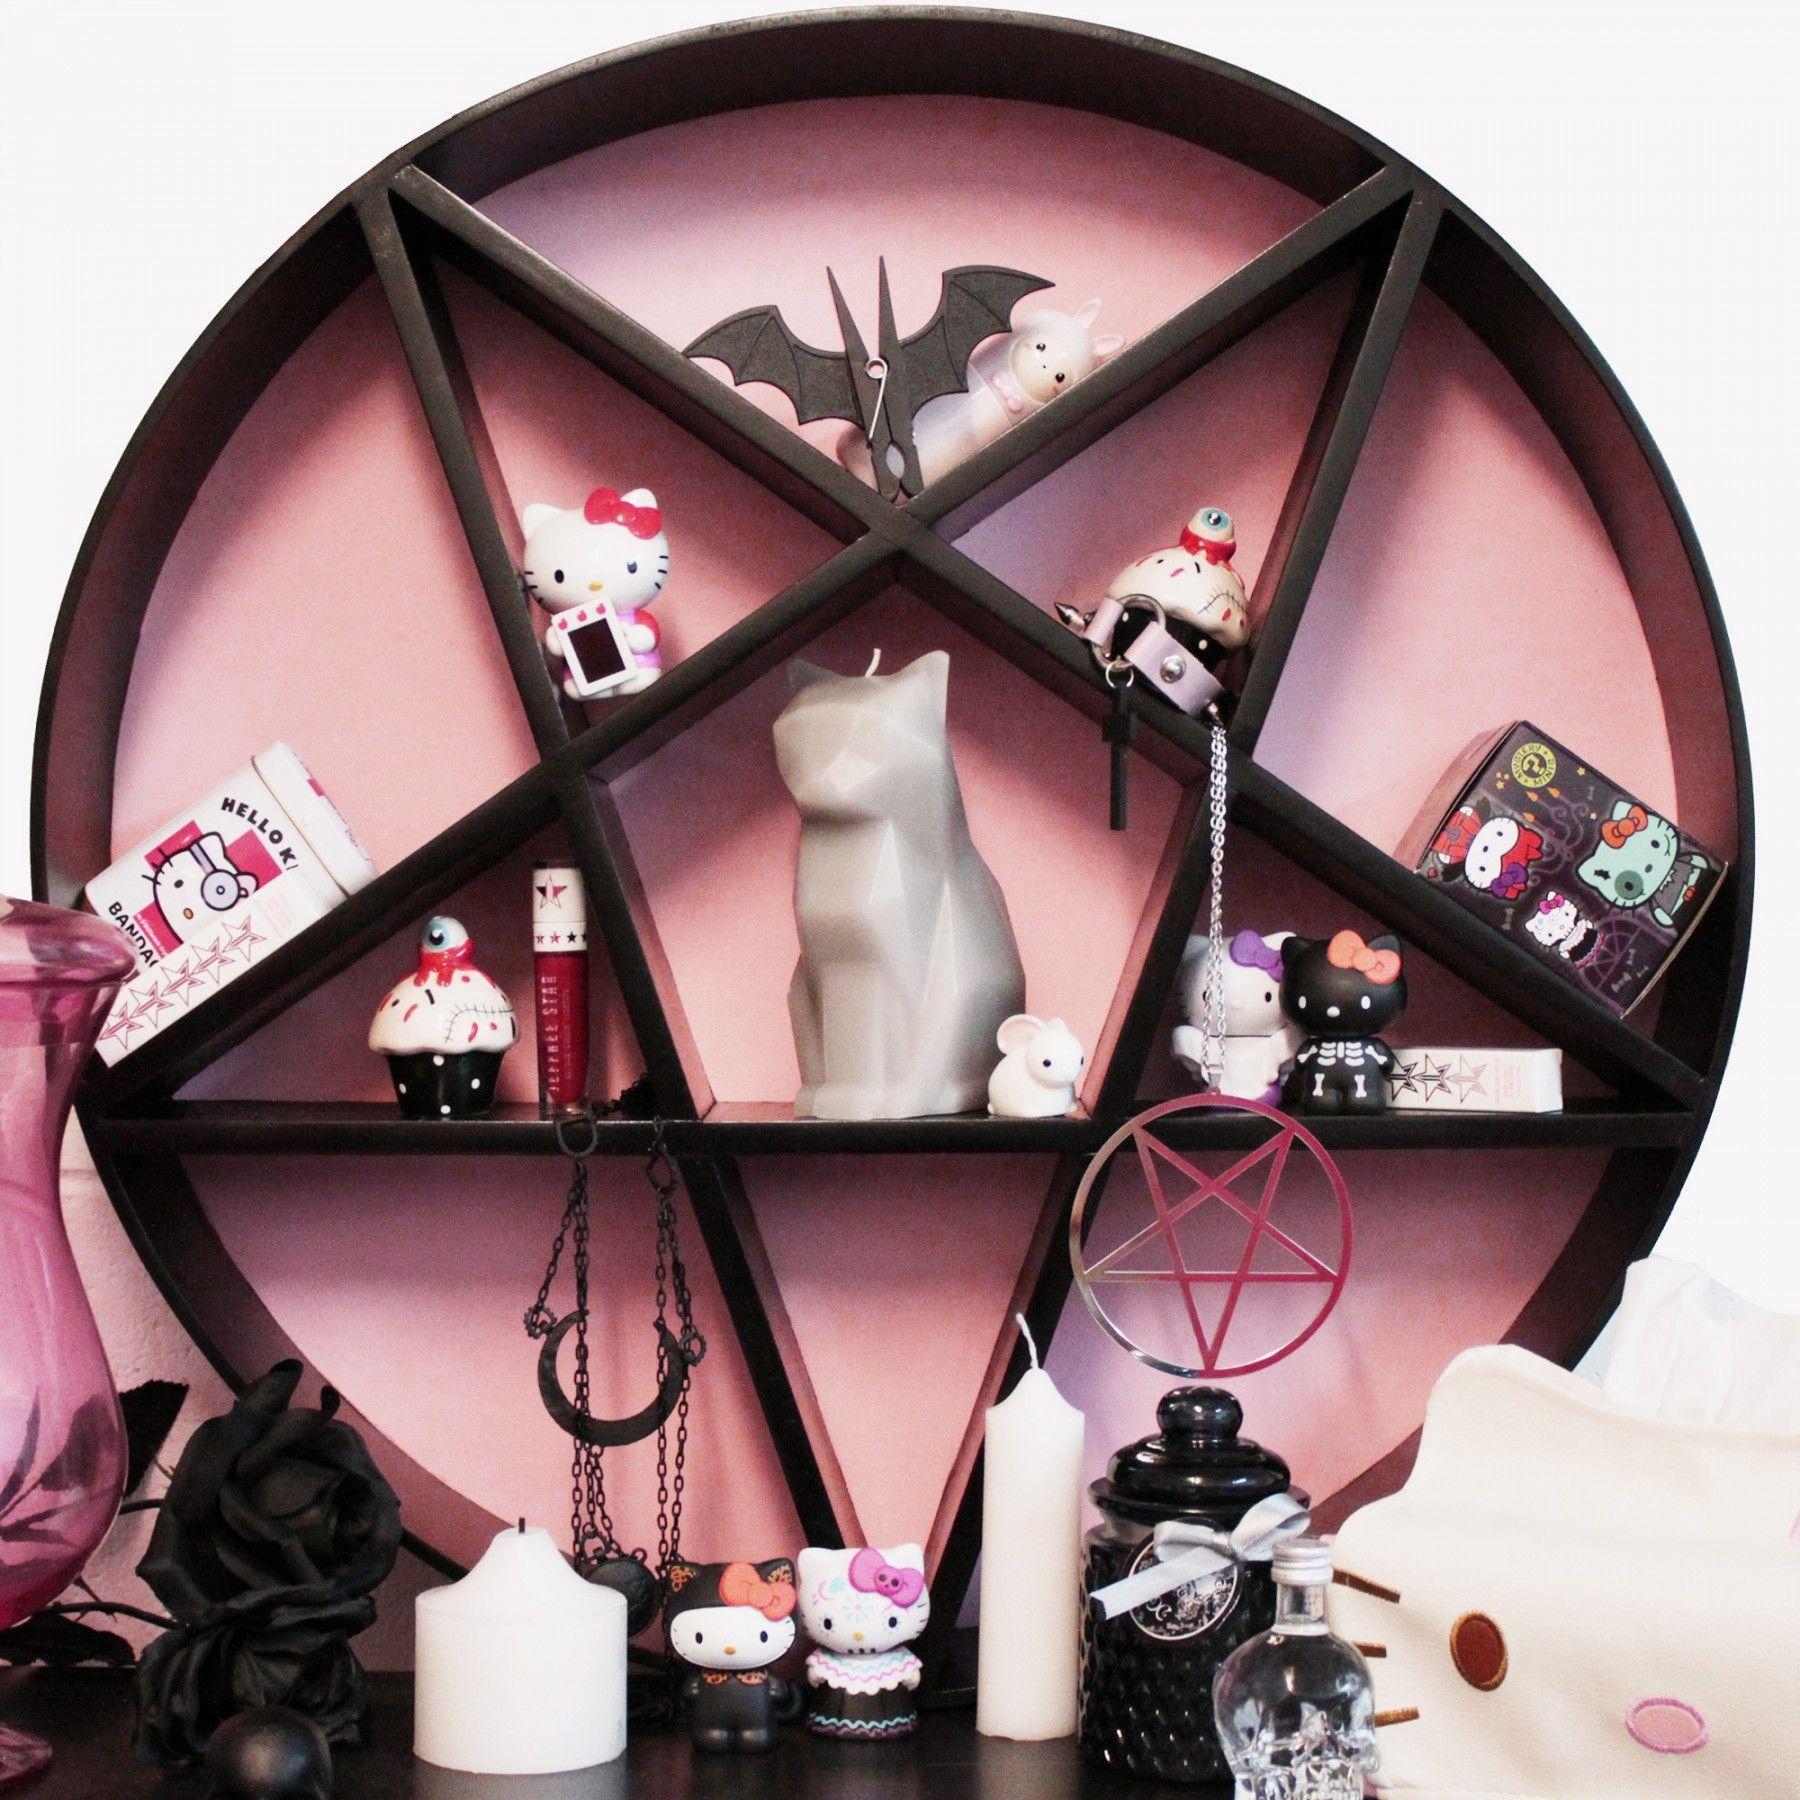 Amazing Handmade Pentagram shelf! Great for displaying